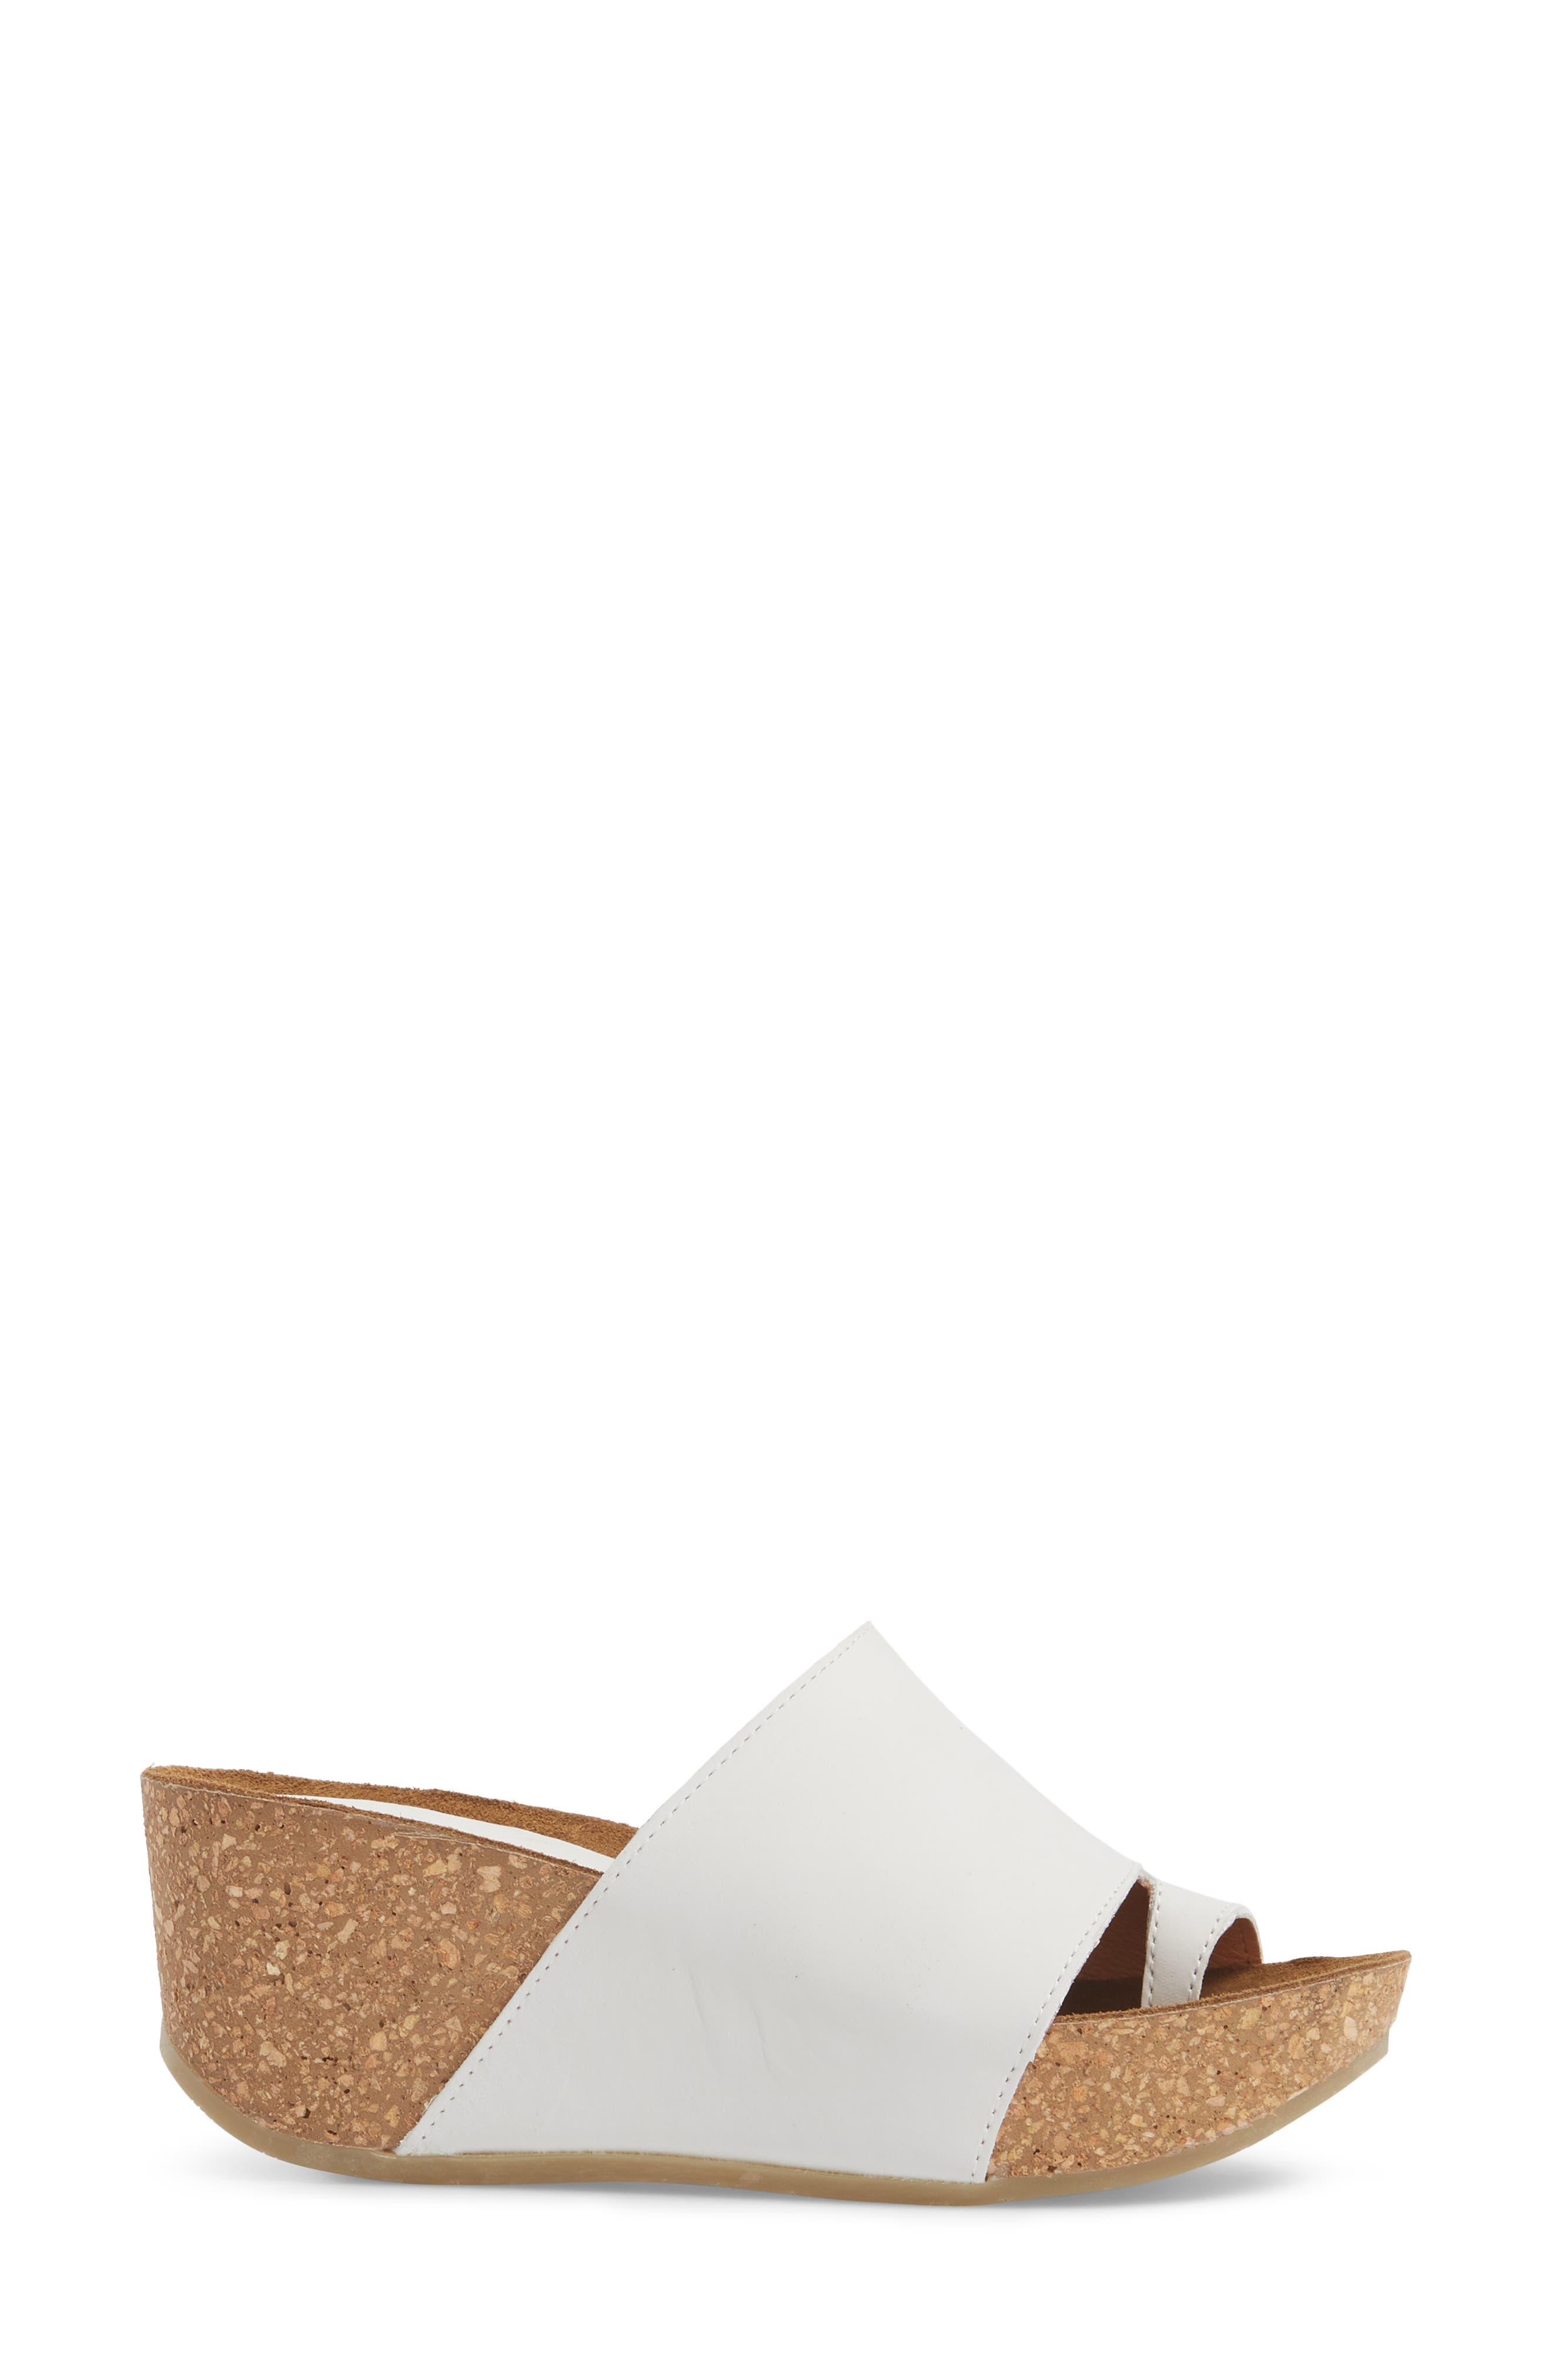 Donald J Pliner Ginie Platform Wedge Sandal,                             Alternate thumbnail 3, color,                             Bone Leather